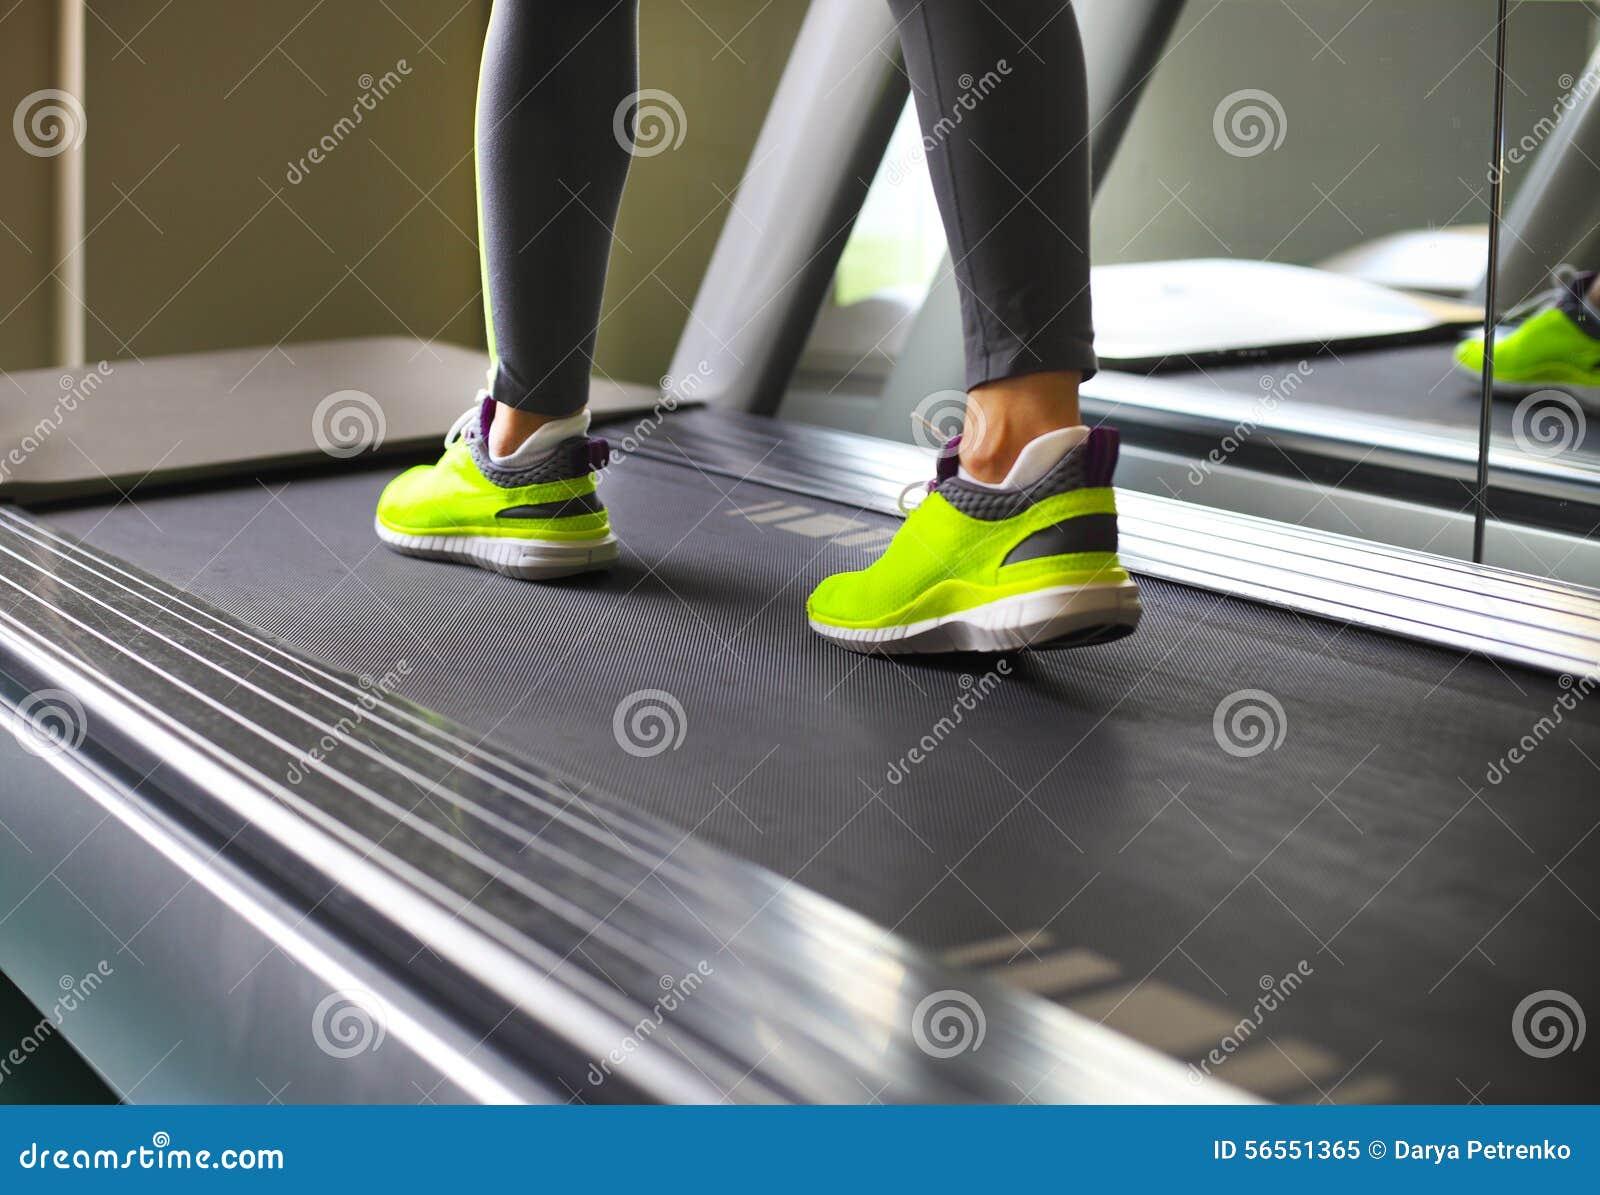 Download Νέες φίλαθλες γυναίκες που κάνουν τις ασκήσεις στο κέντρο γυμναστικής Στοκ Εικόνα - εικόνα από λέσχη, ηθοποιών: 56551365